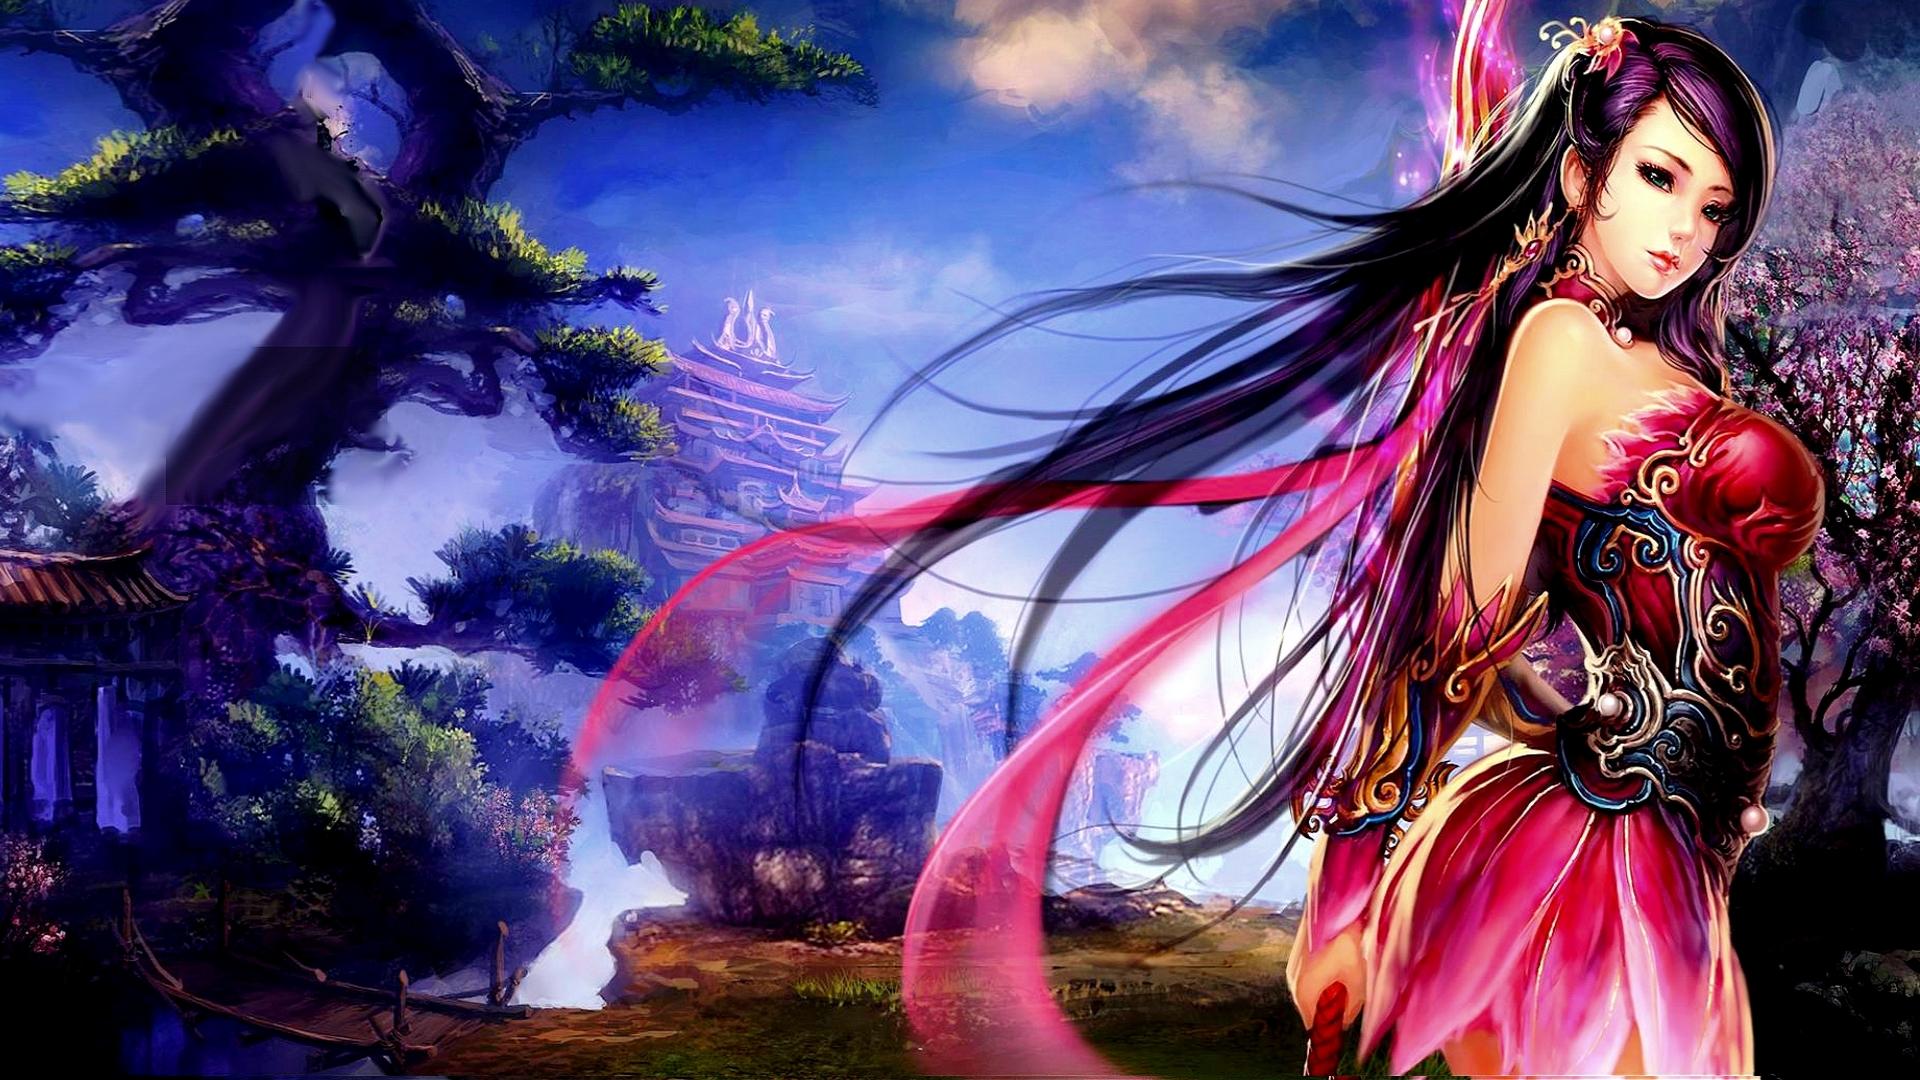 Fantasy Images Fantasy Wallpaper Photos (31301585